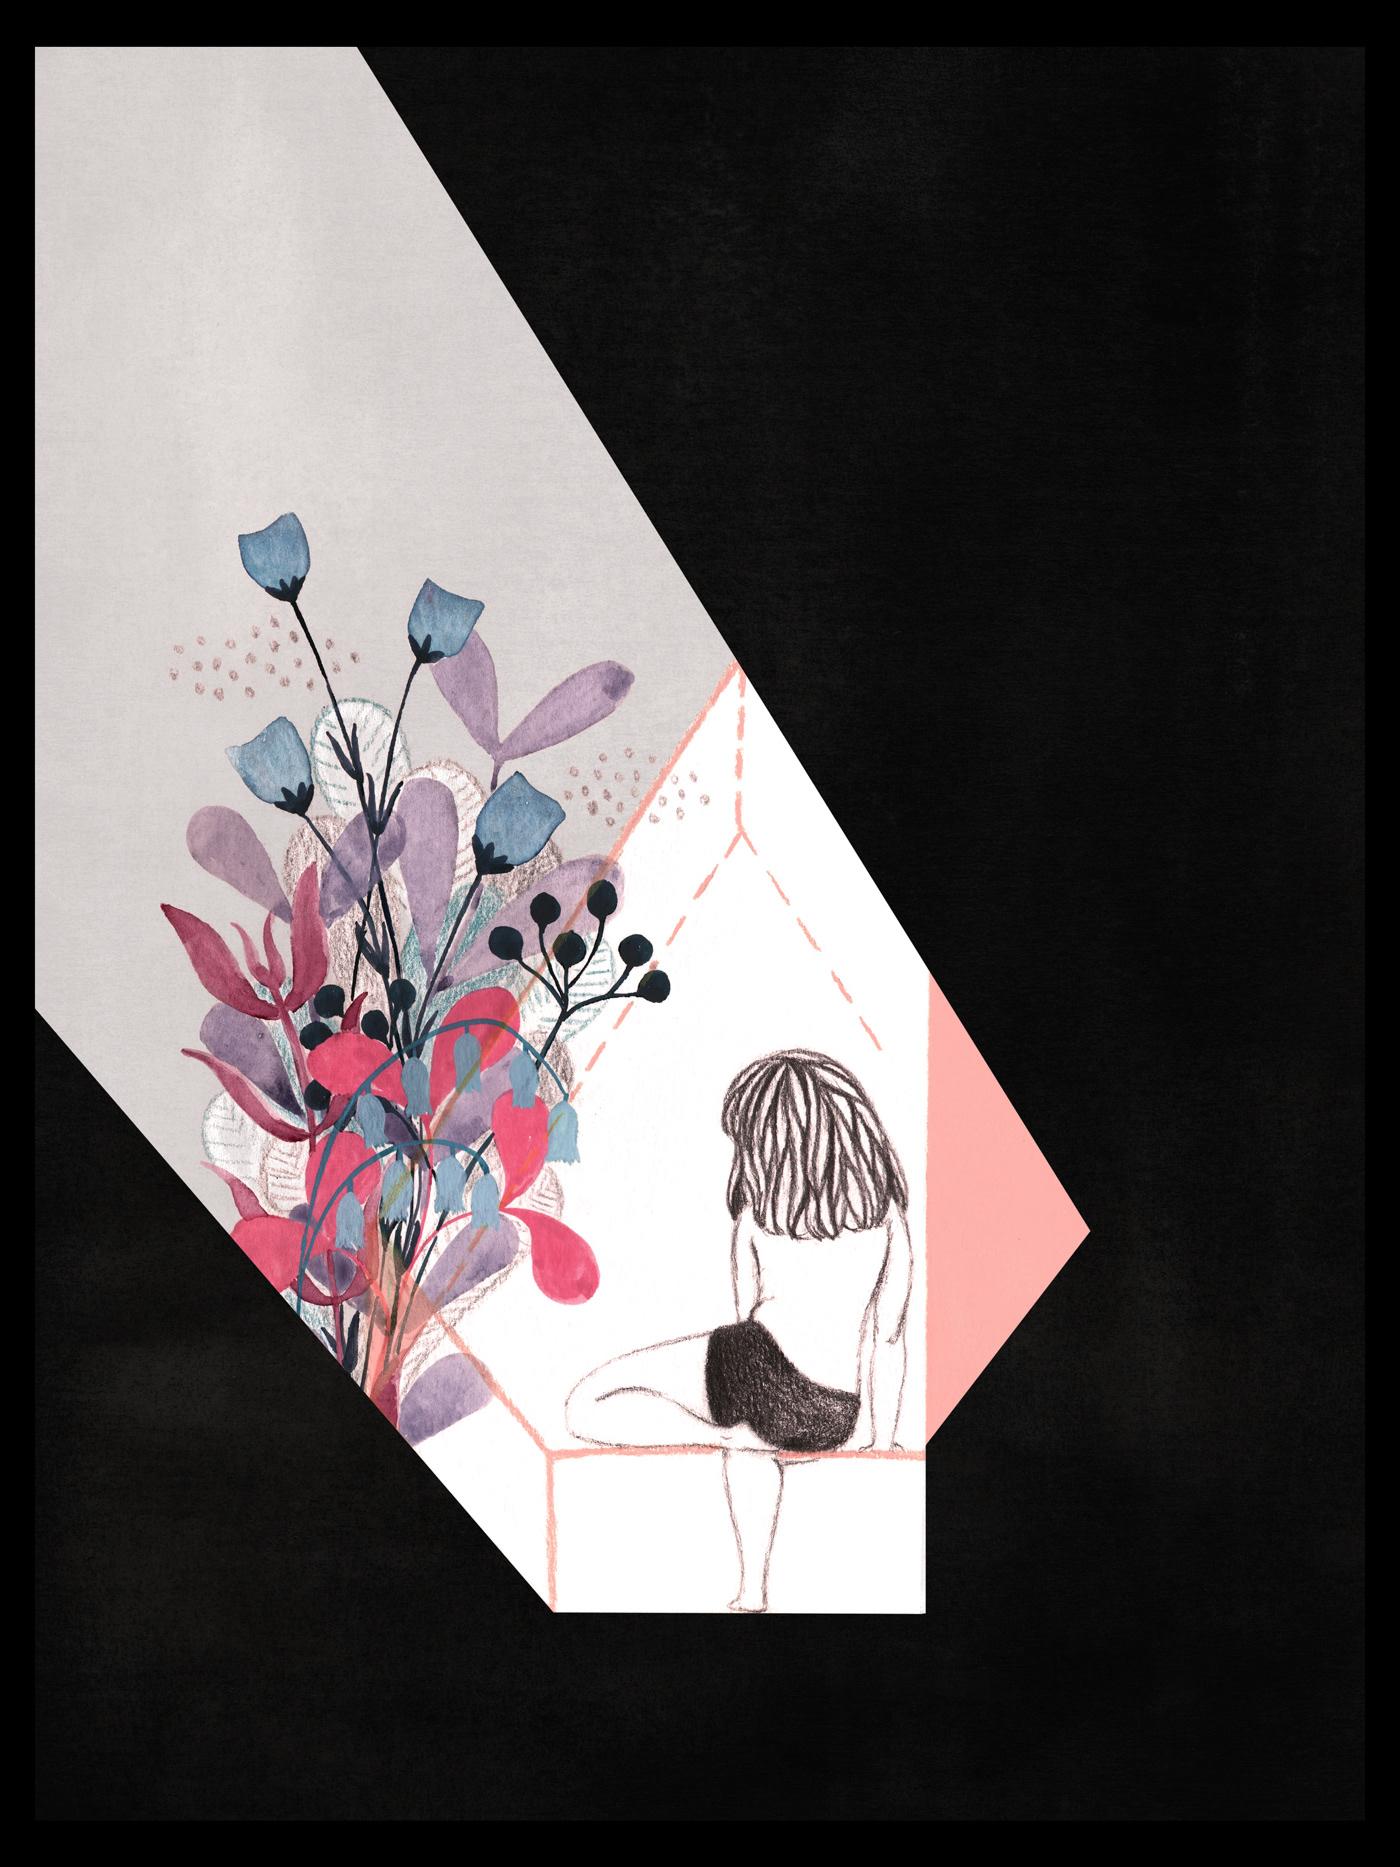 ILLUSTRATION  ilustracion poem poetryillustration woman deep